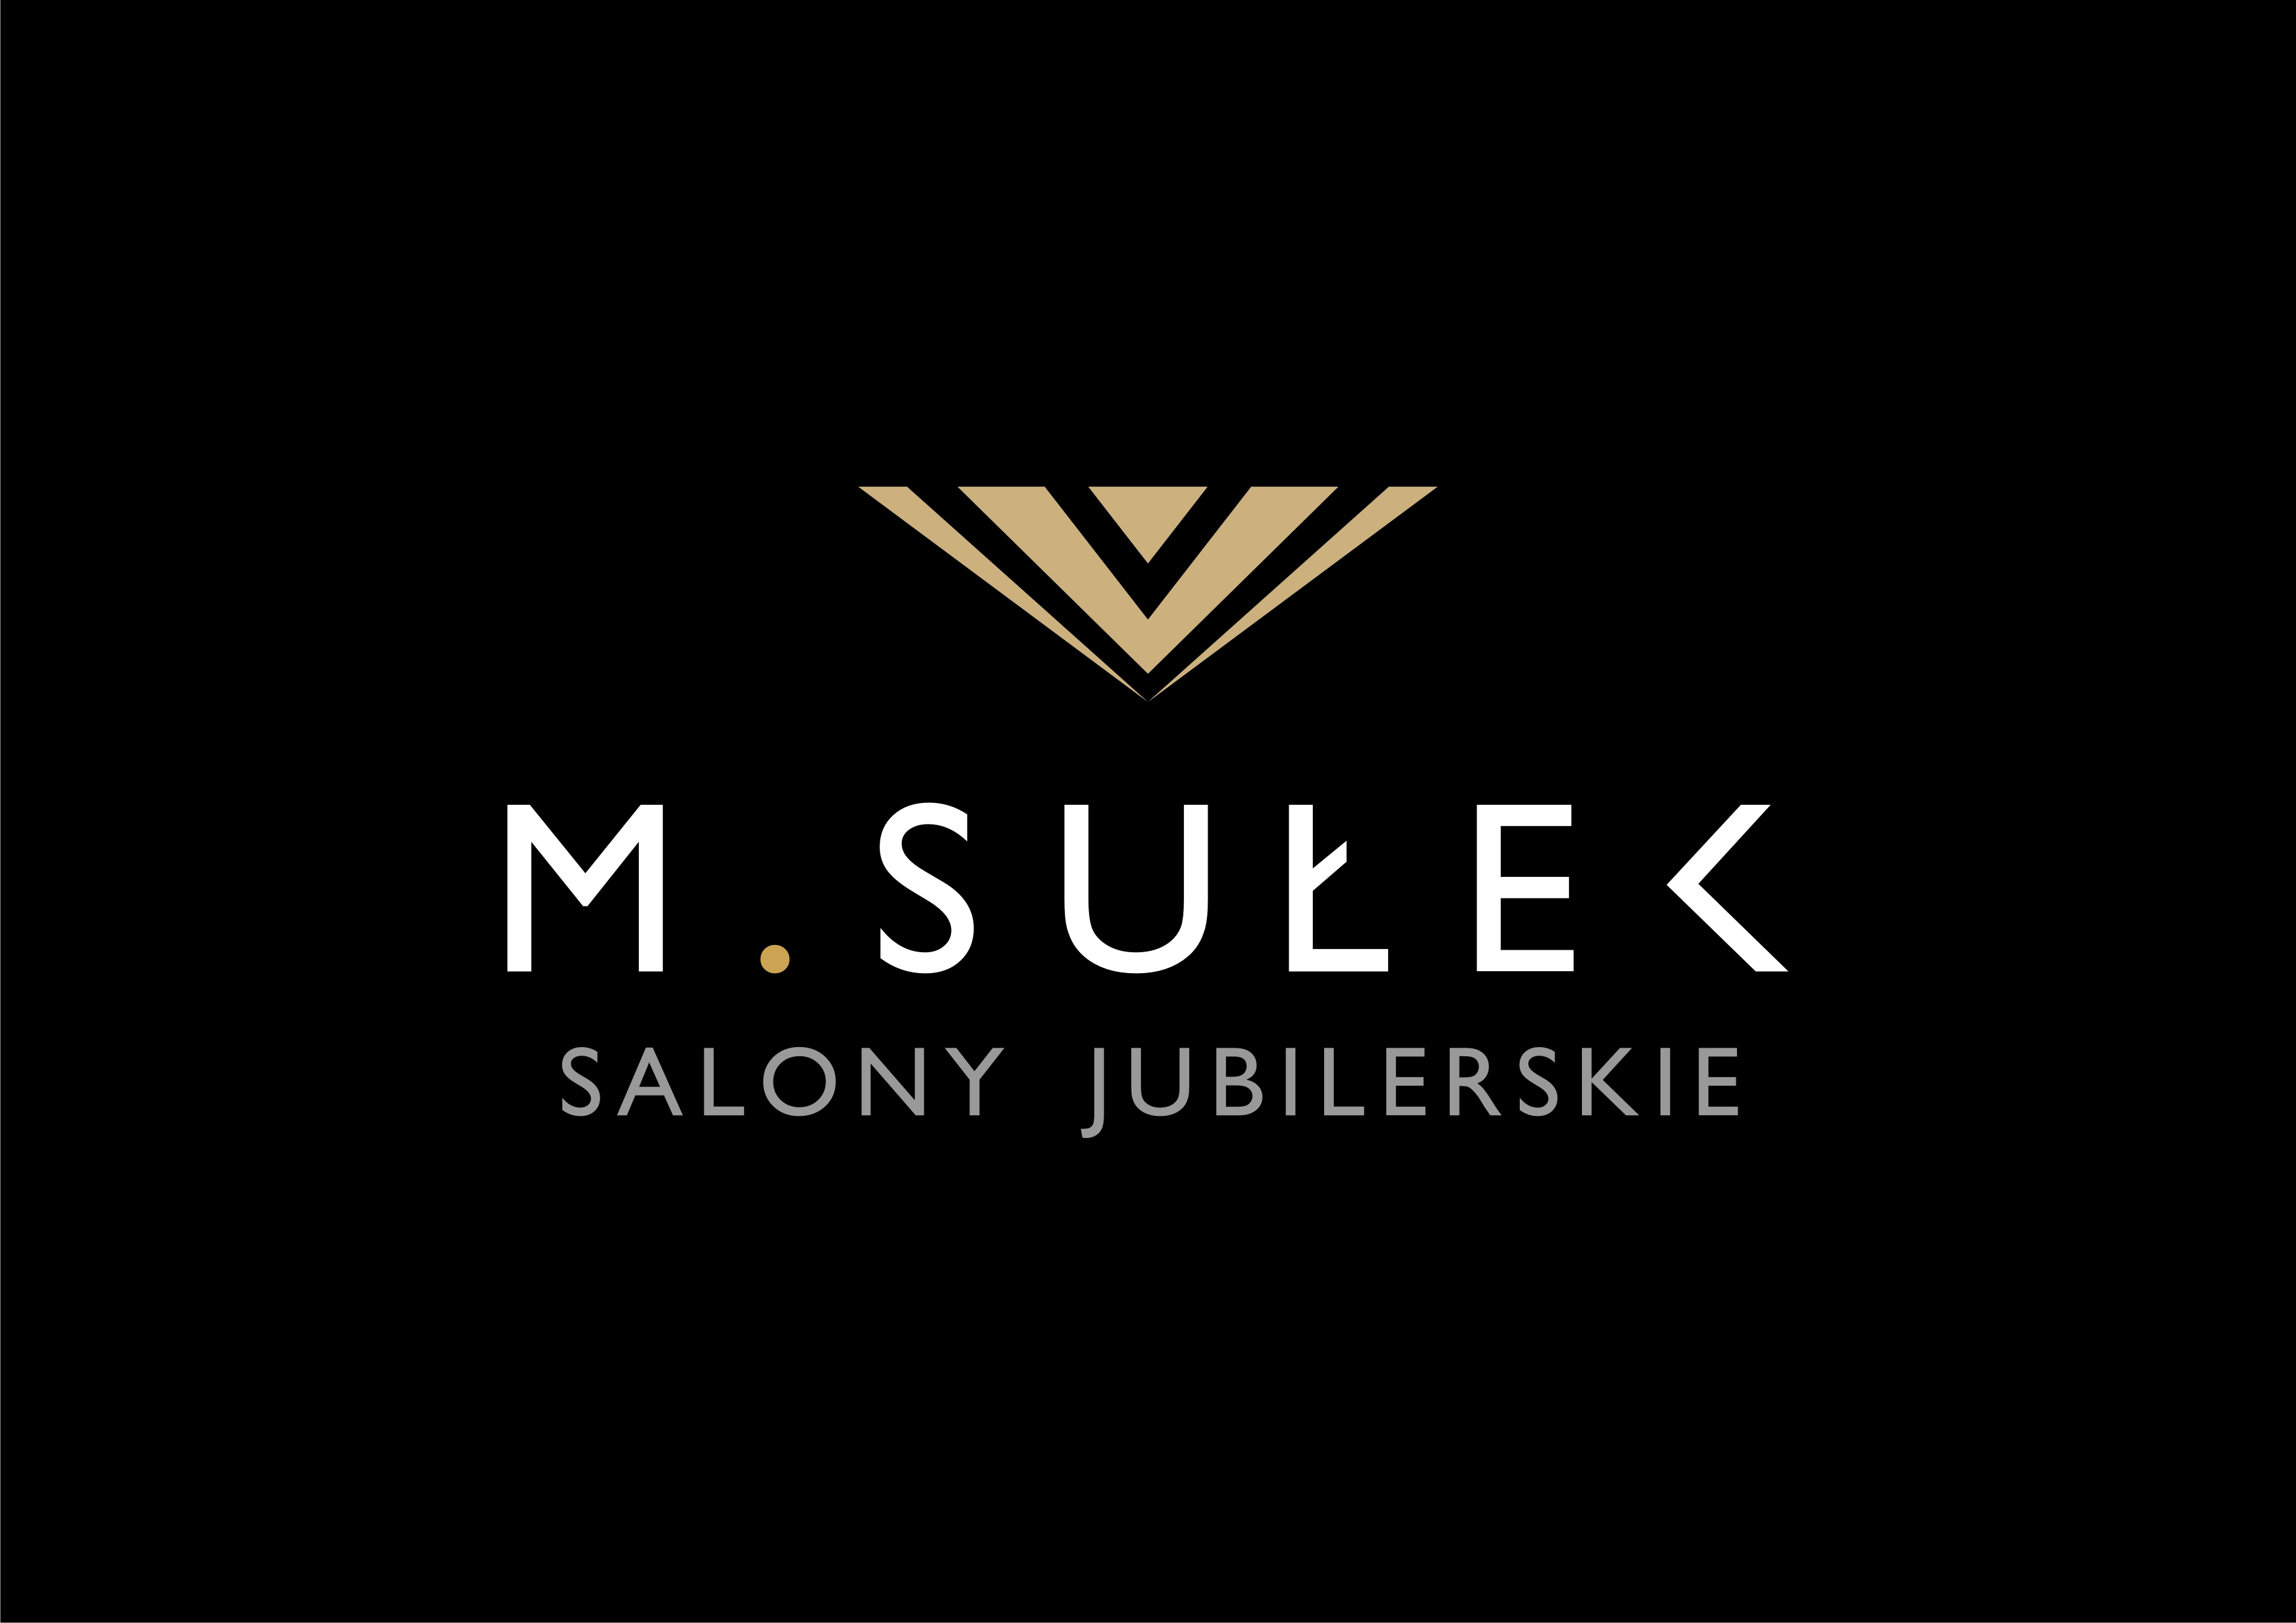 M.SUŁEK